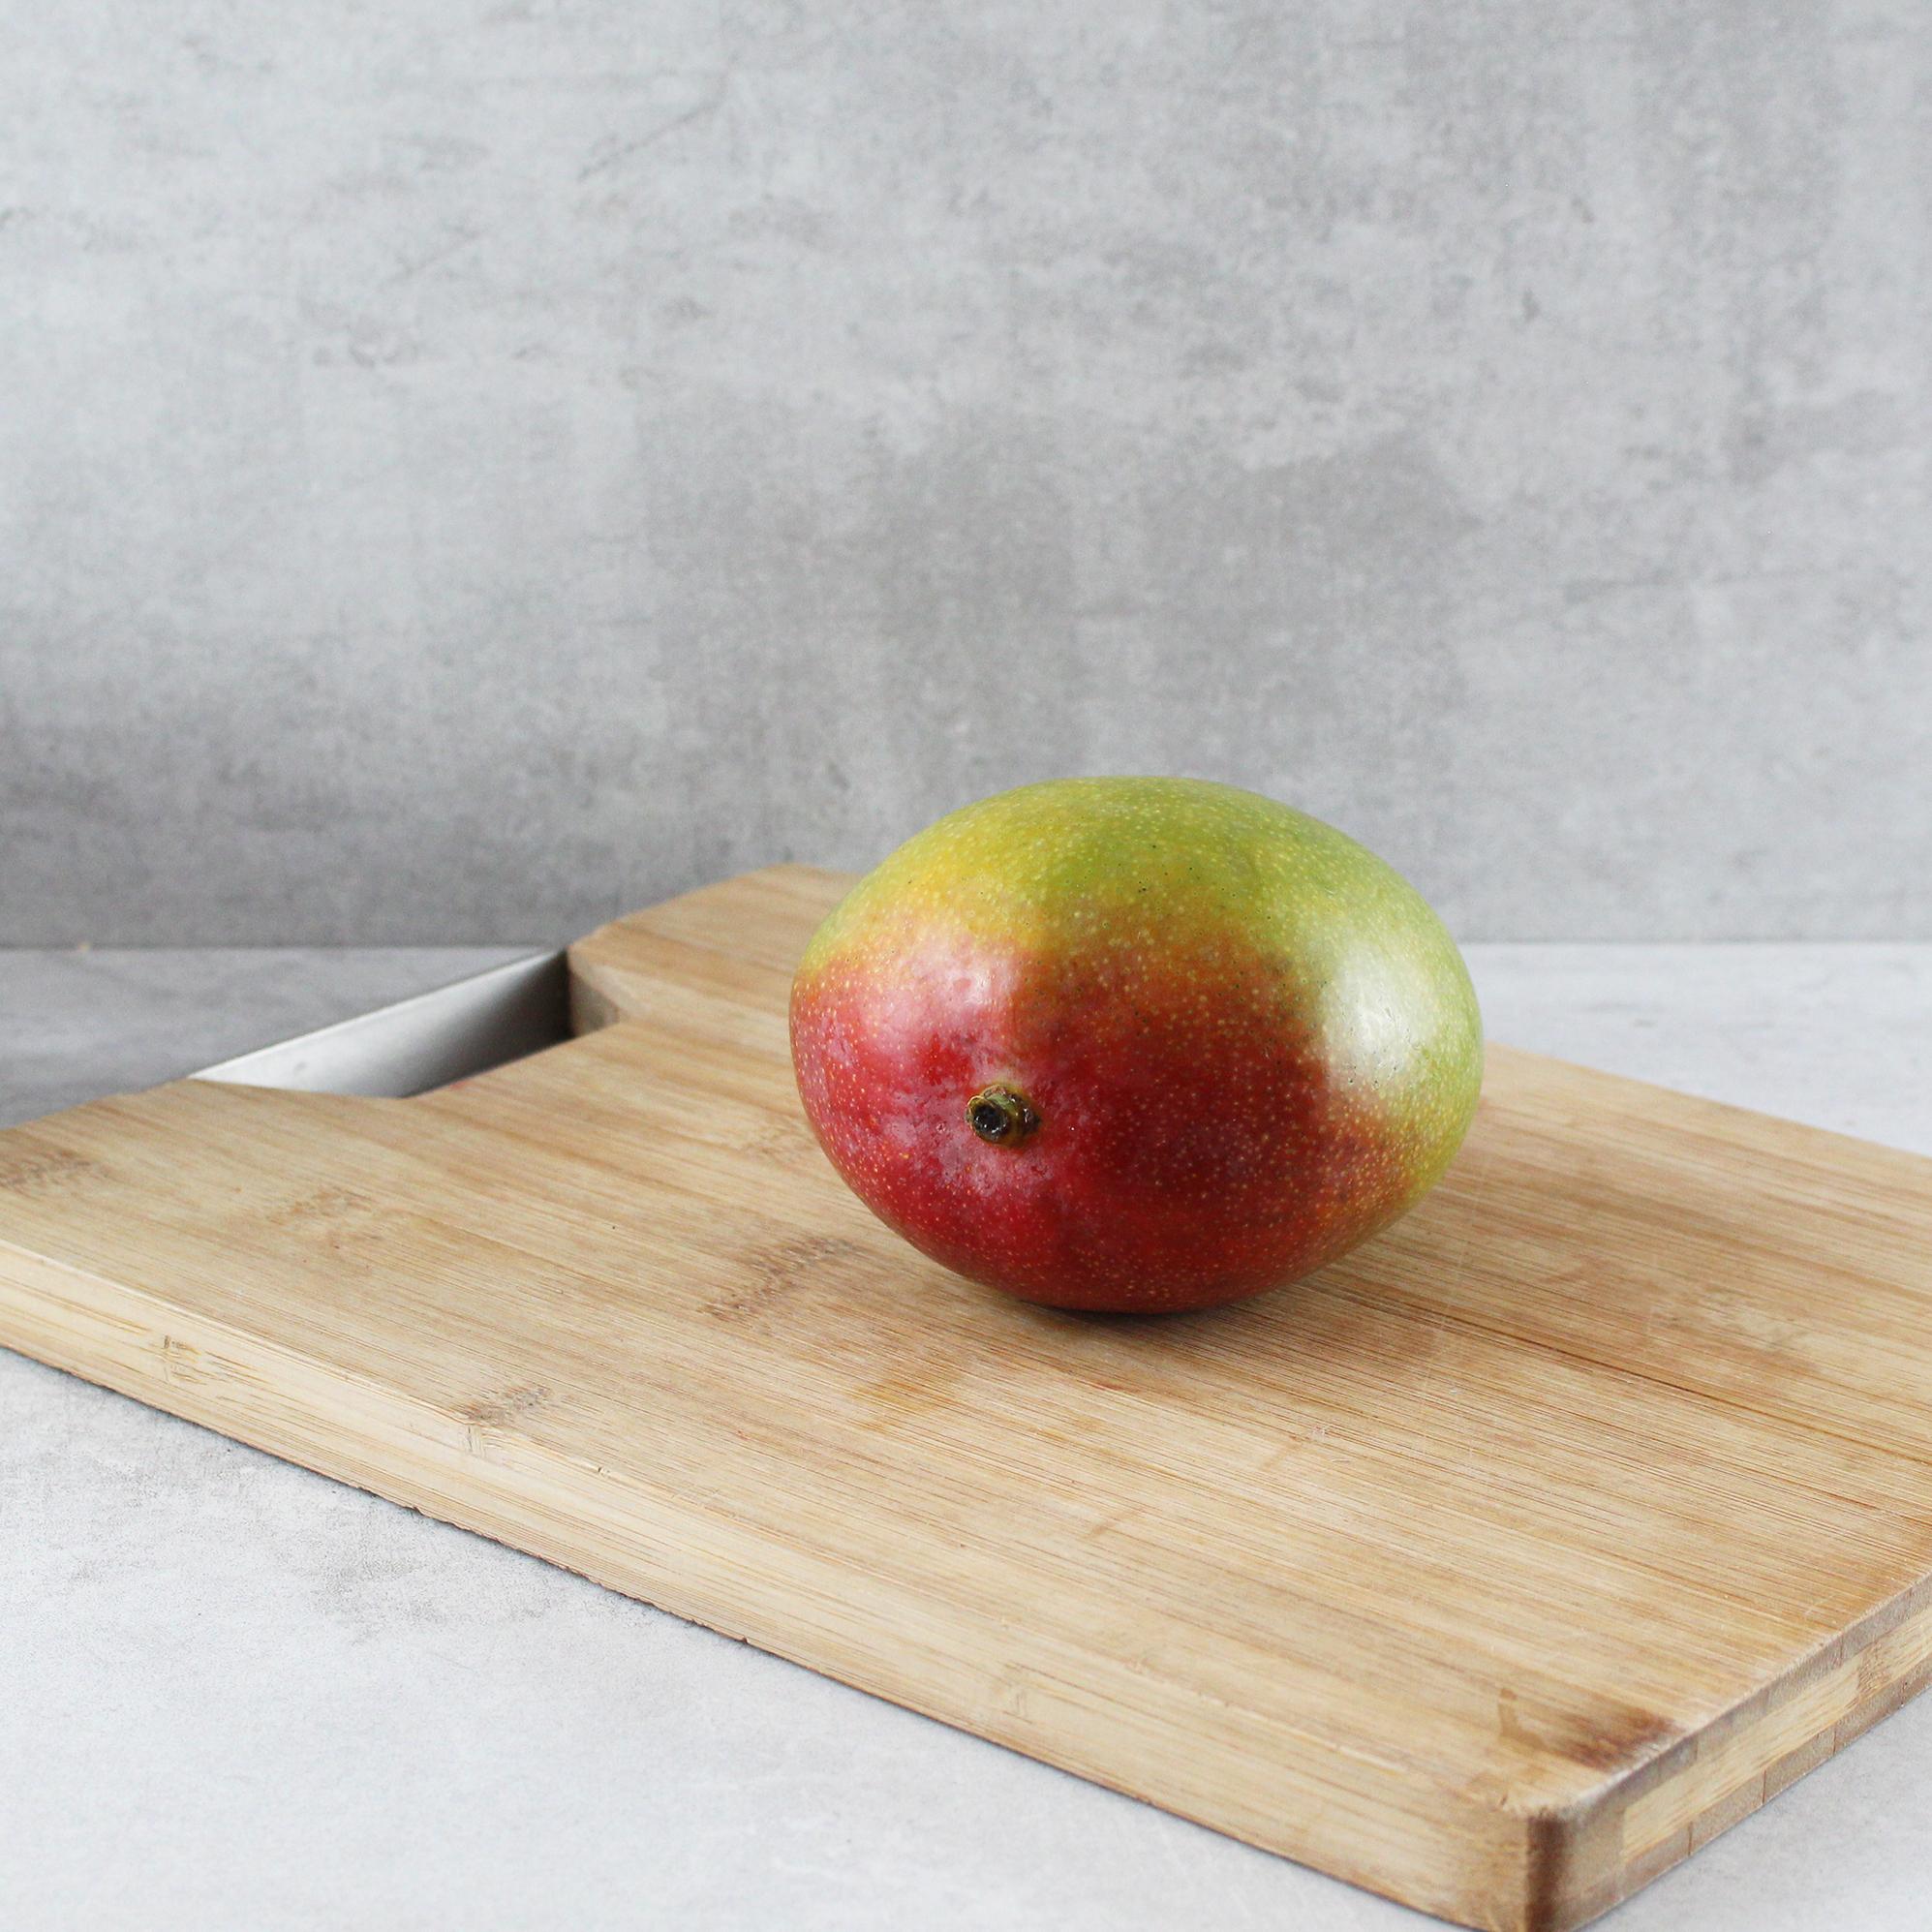 mango-9-st.-kiste-ready-to-eat-brasilien-markthalle20-1